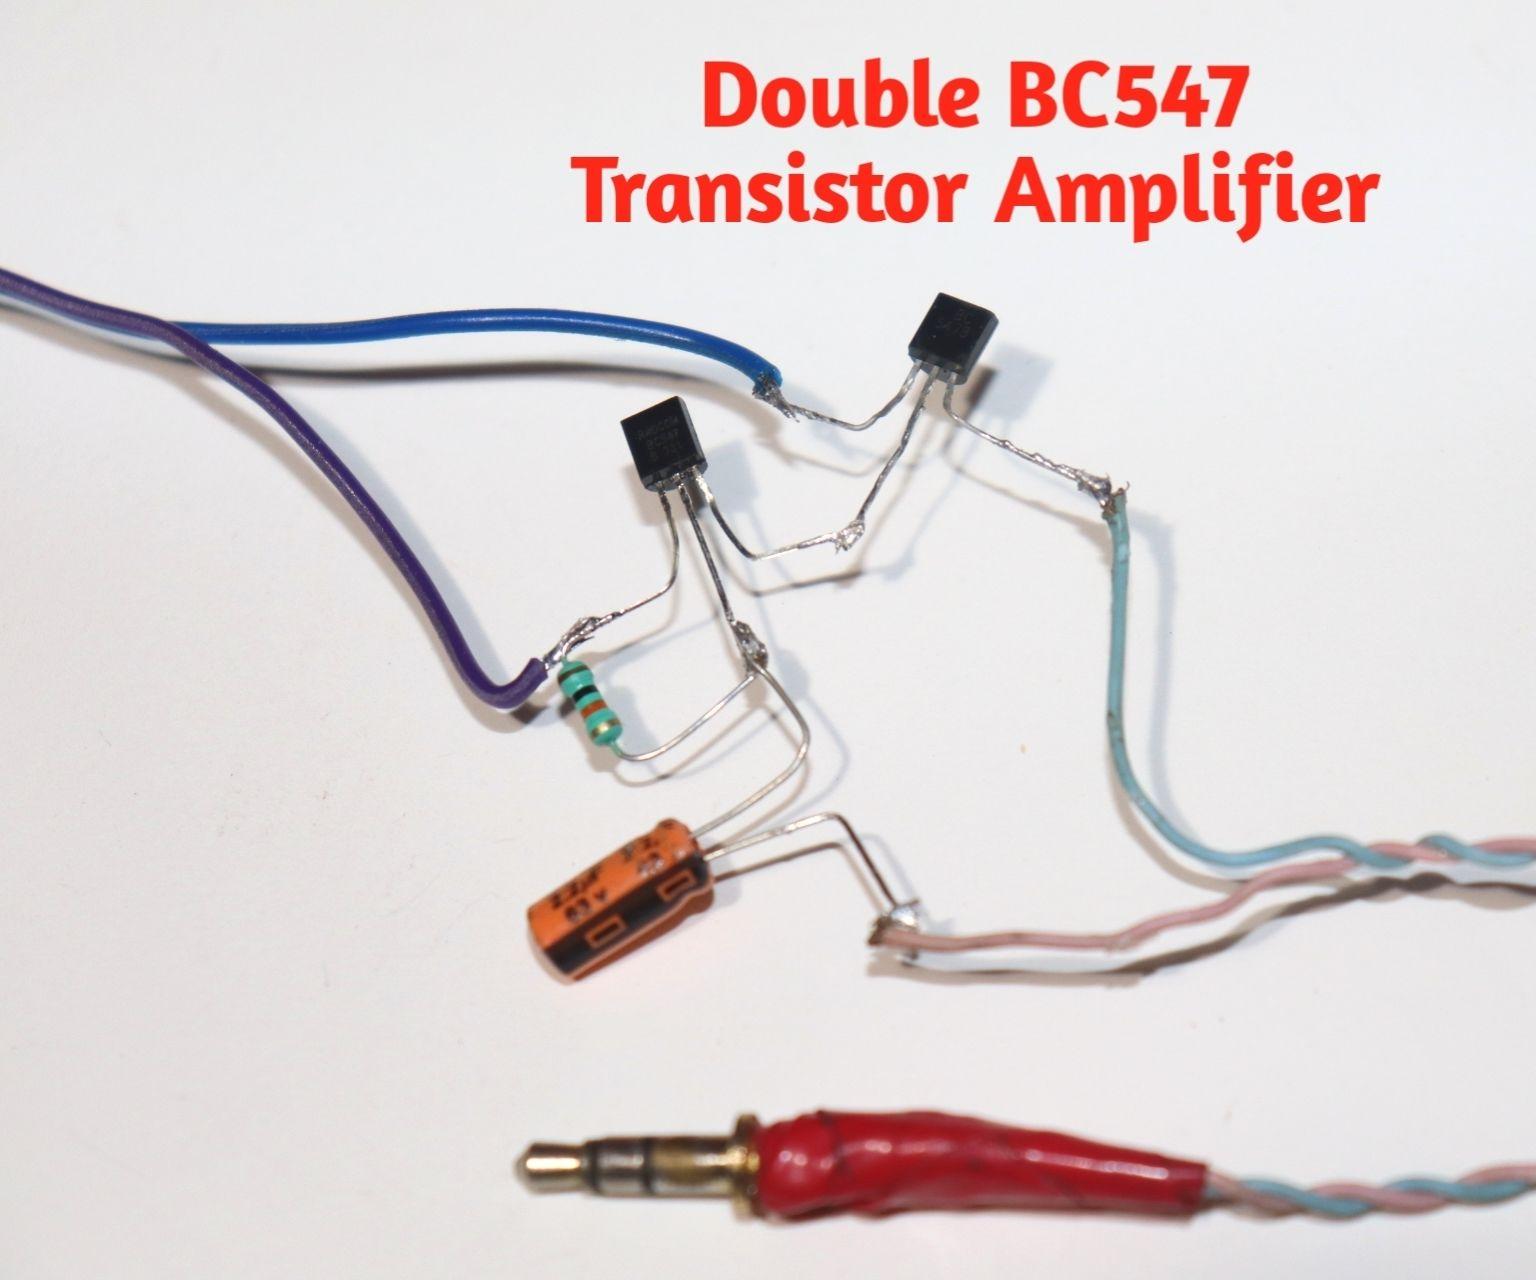 BC547 Double Transistor Audio Amplifier